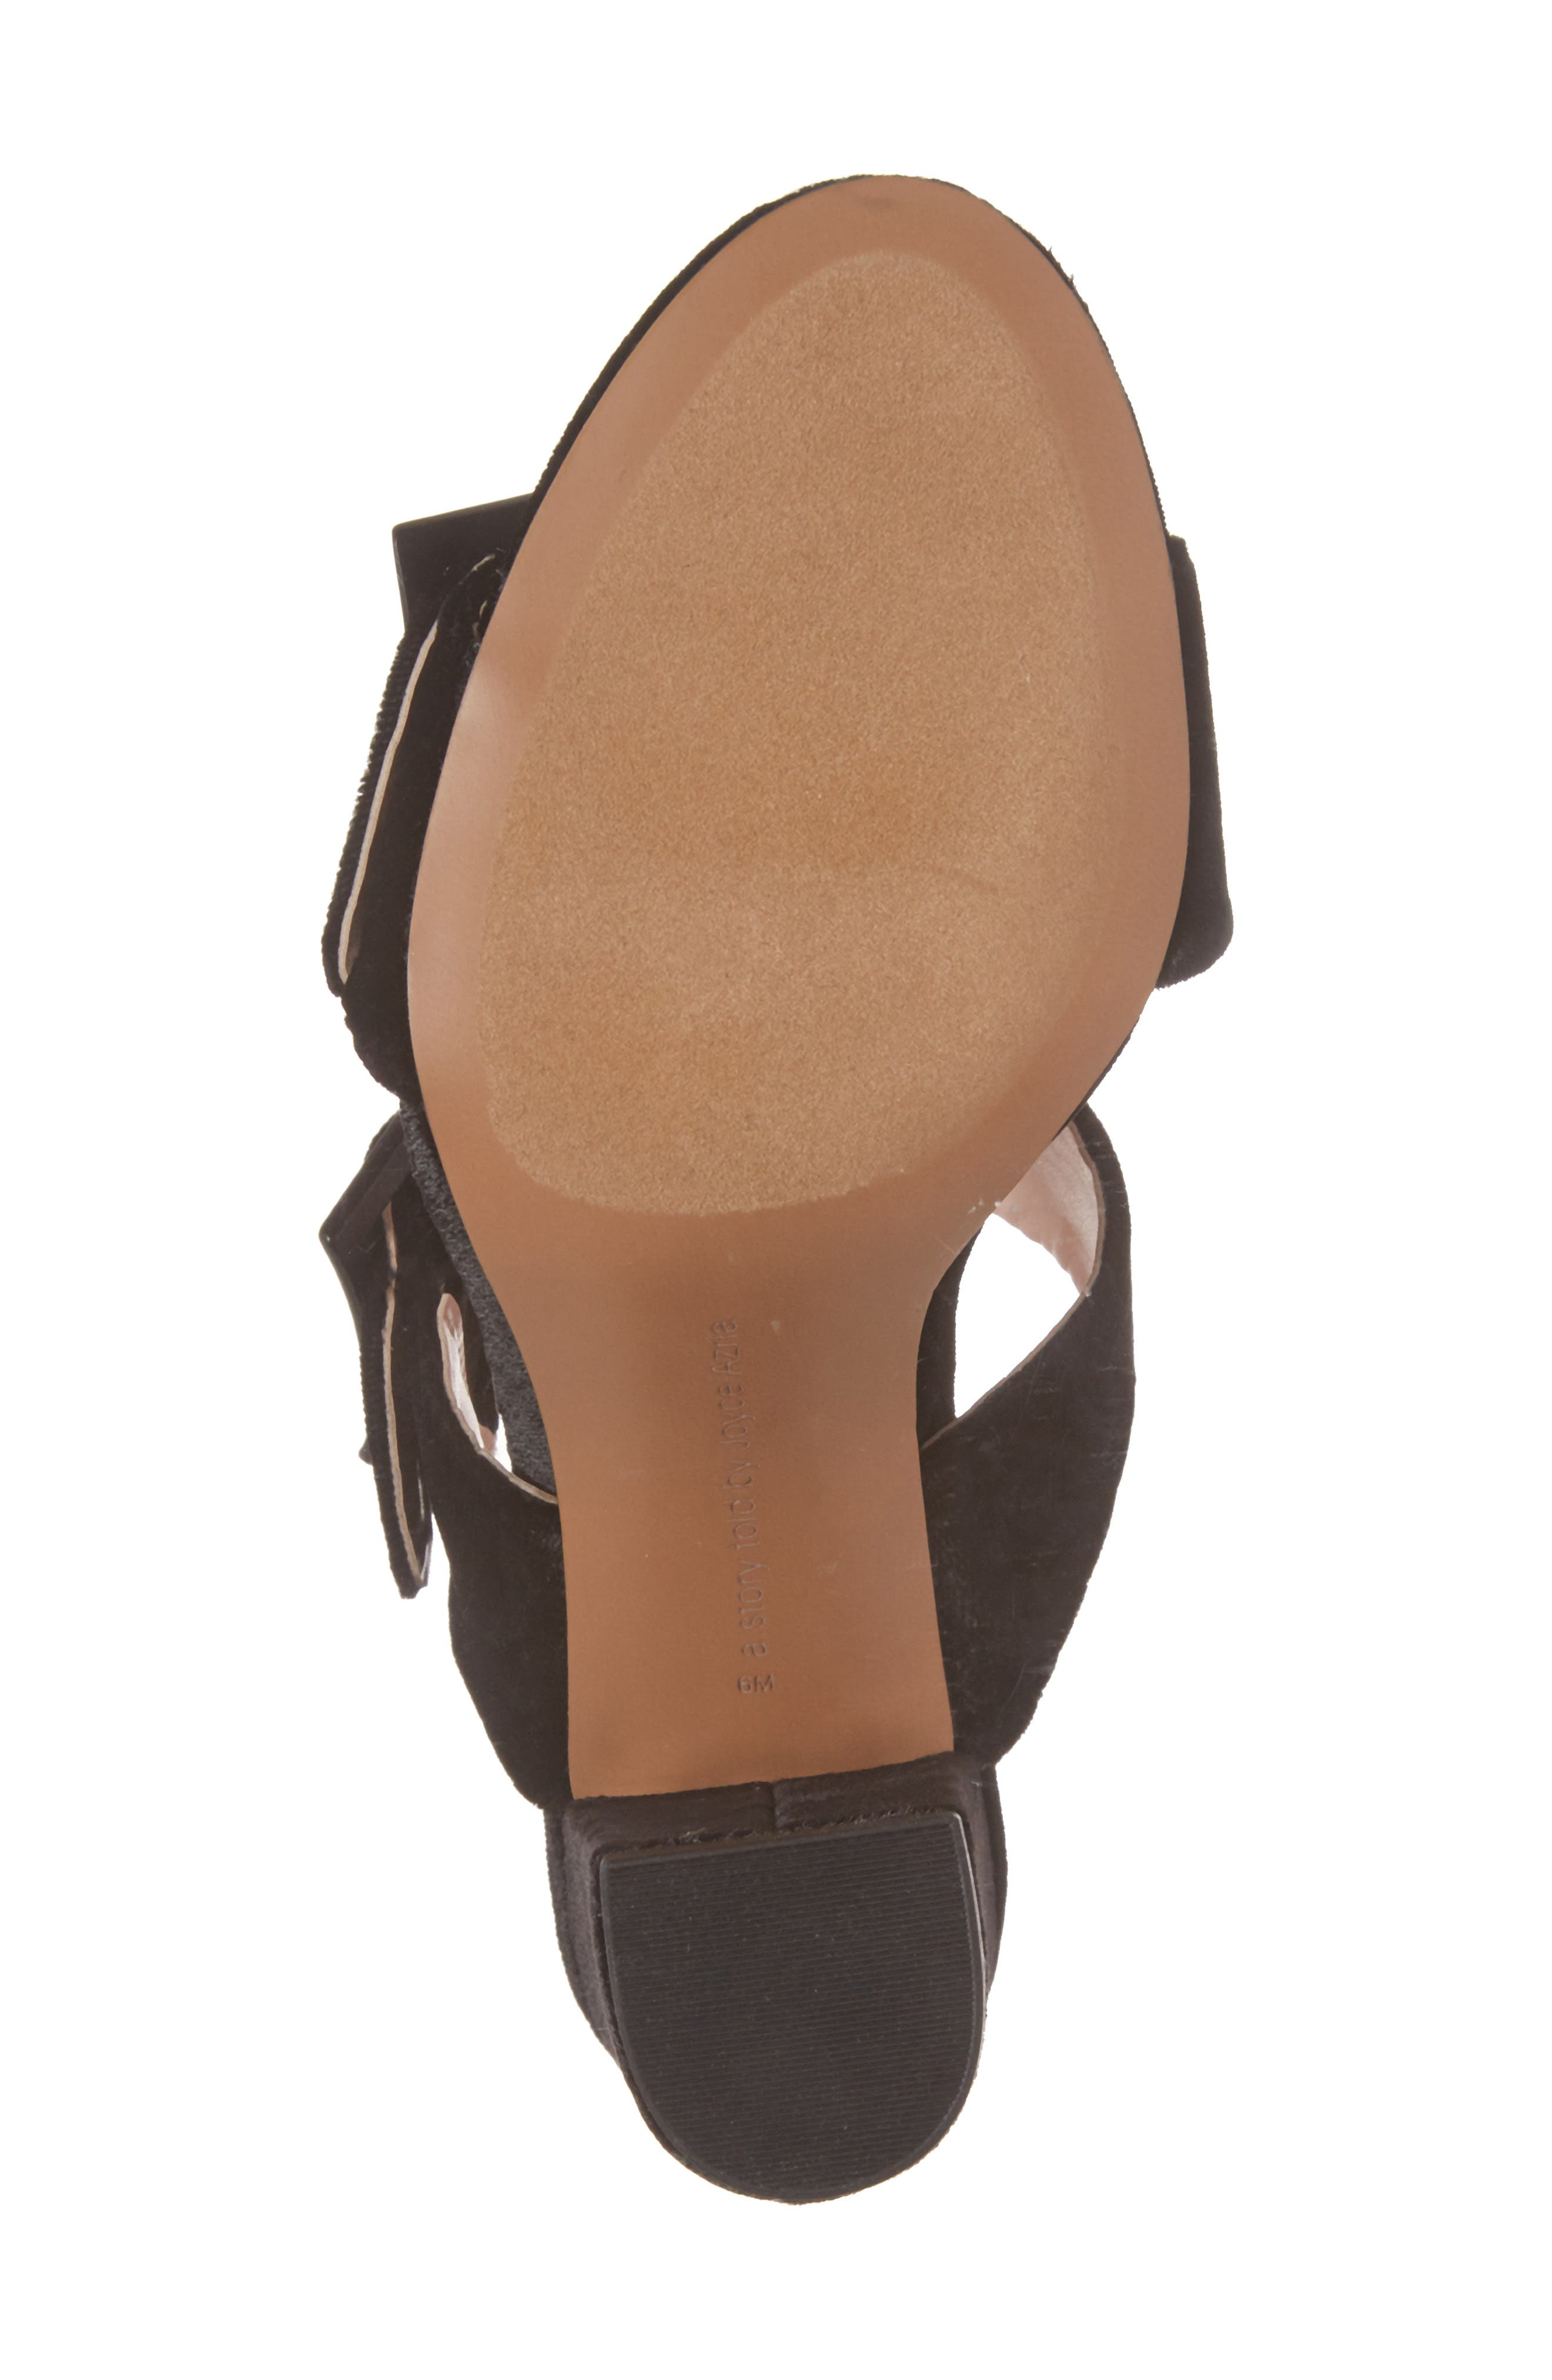 Millie Buckle Strap Sandal,                             Alternate thumbnail 6, color,                             Black Fabric